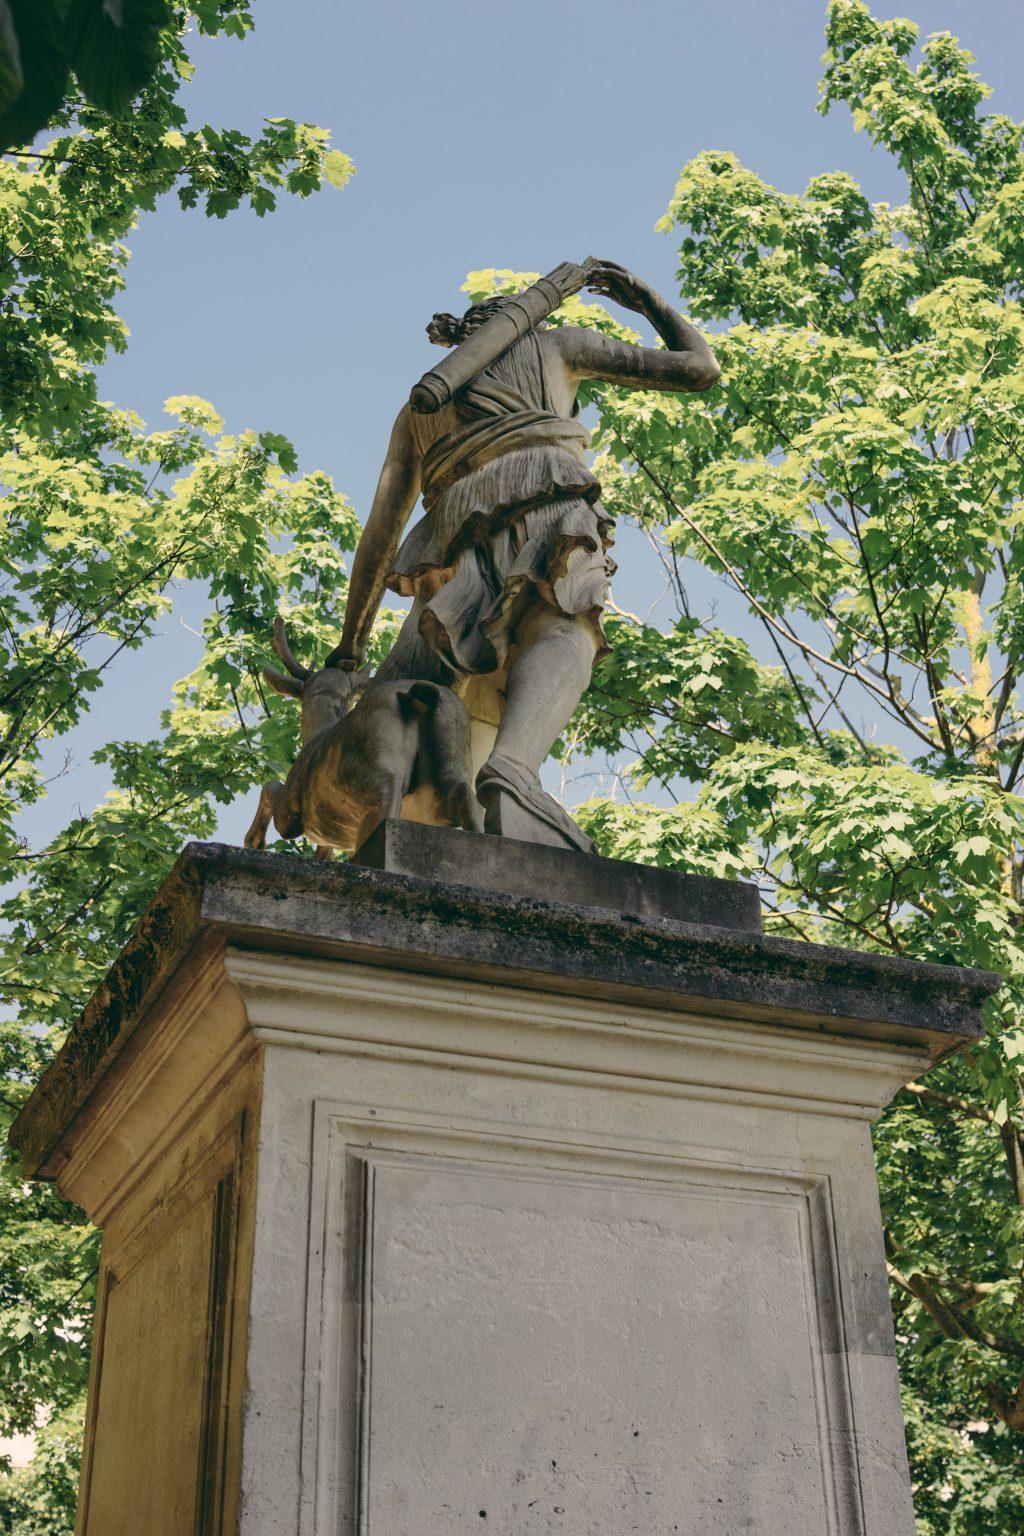 Paris, France, May 2018 - Statue of Artemis, goddess of hunting and animals at the Jardins des Tuileries. >< Parigi, Francia, maggio 2018 -  Statua di Artemide, dea della caccia e degli animali ai Jardins des Tuileries. *** SPECIAL   FEE   APPLIES ***